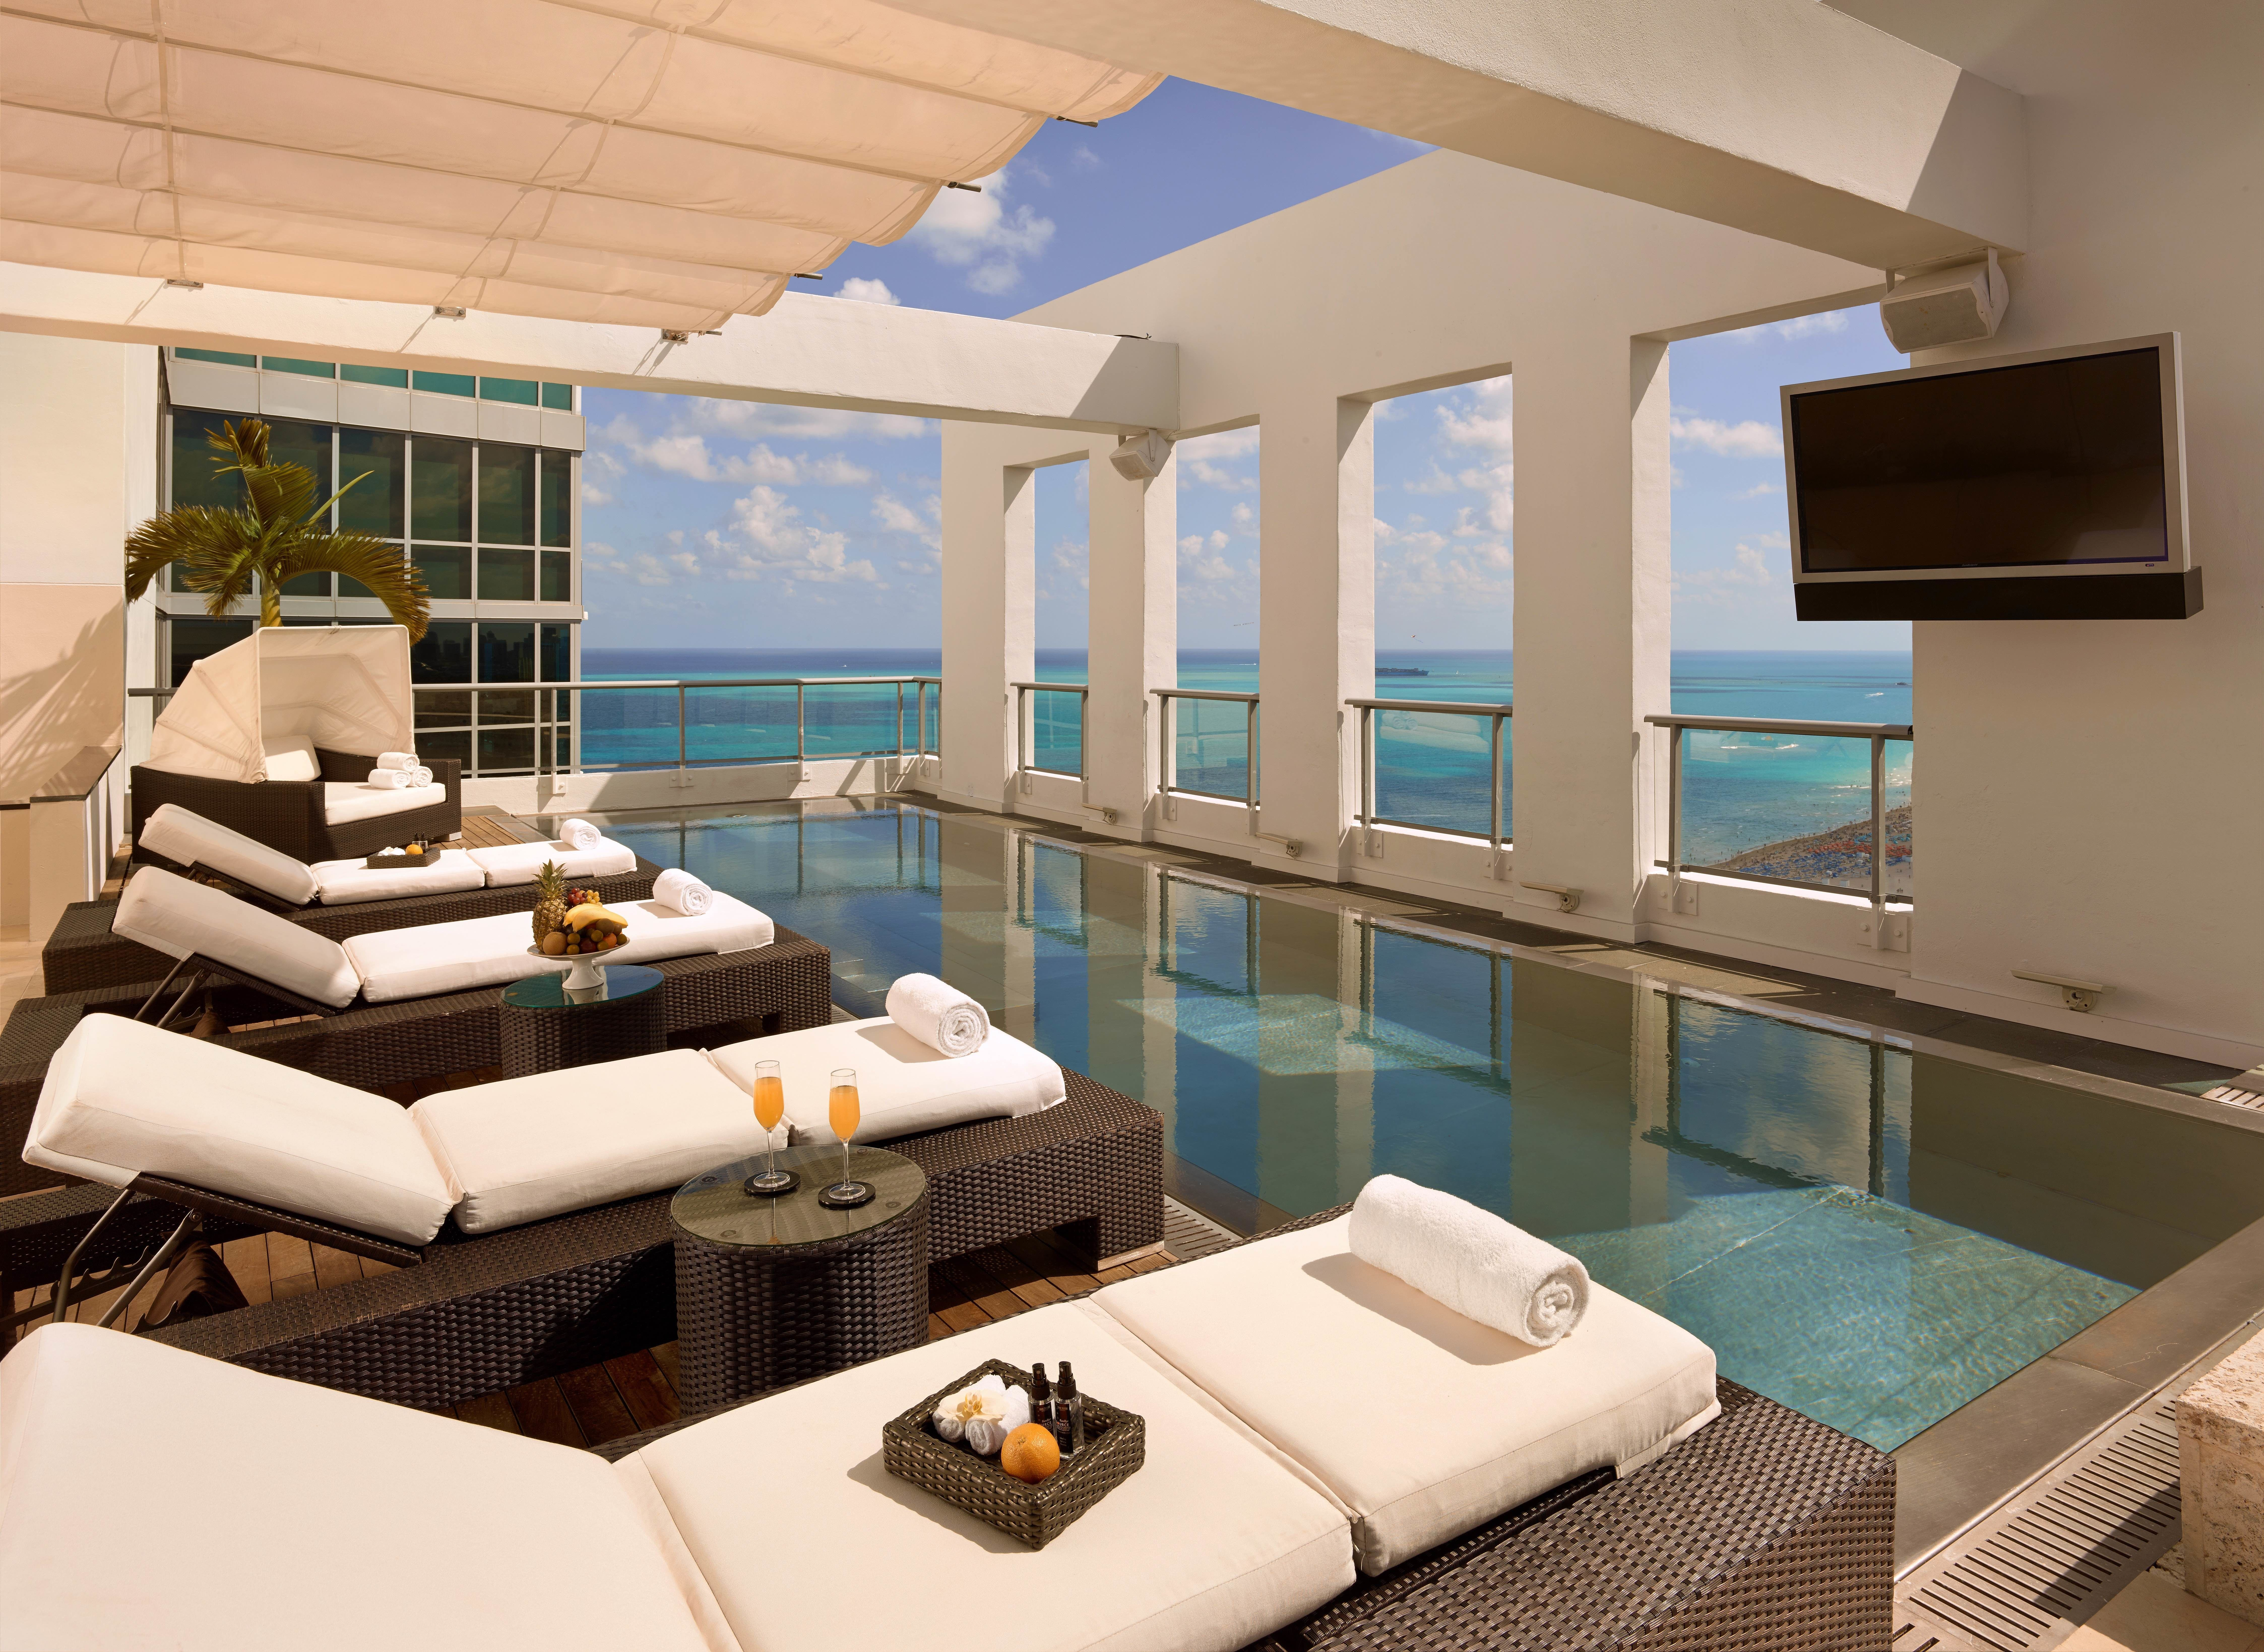 6 of Miami Beach's Top Hotel Suites Miami hotels, Luxury hot